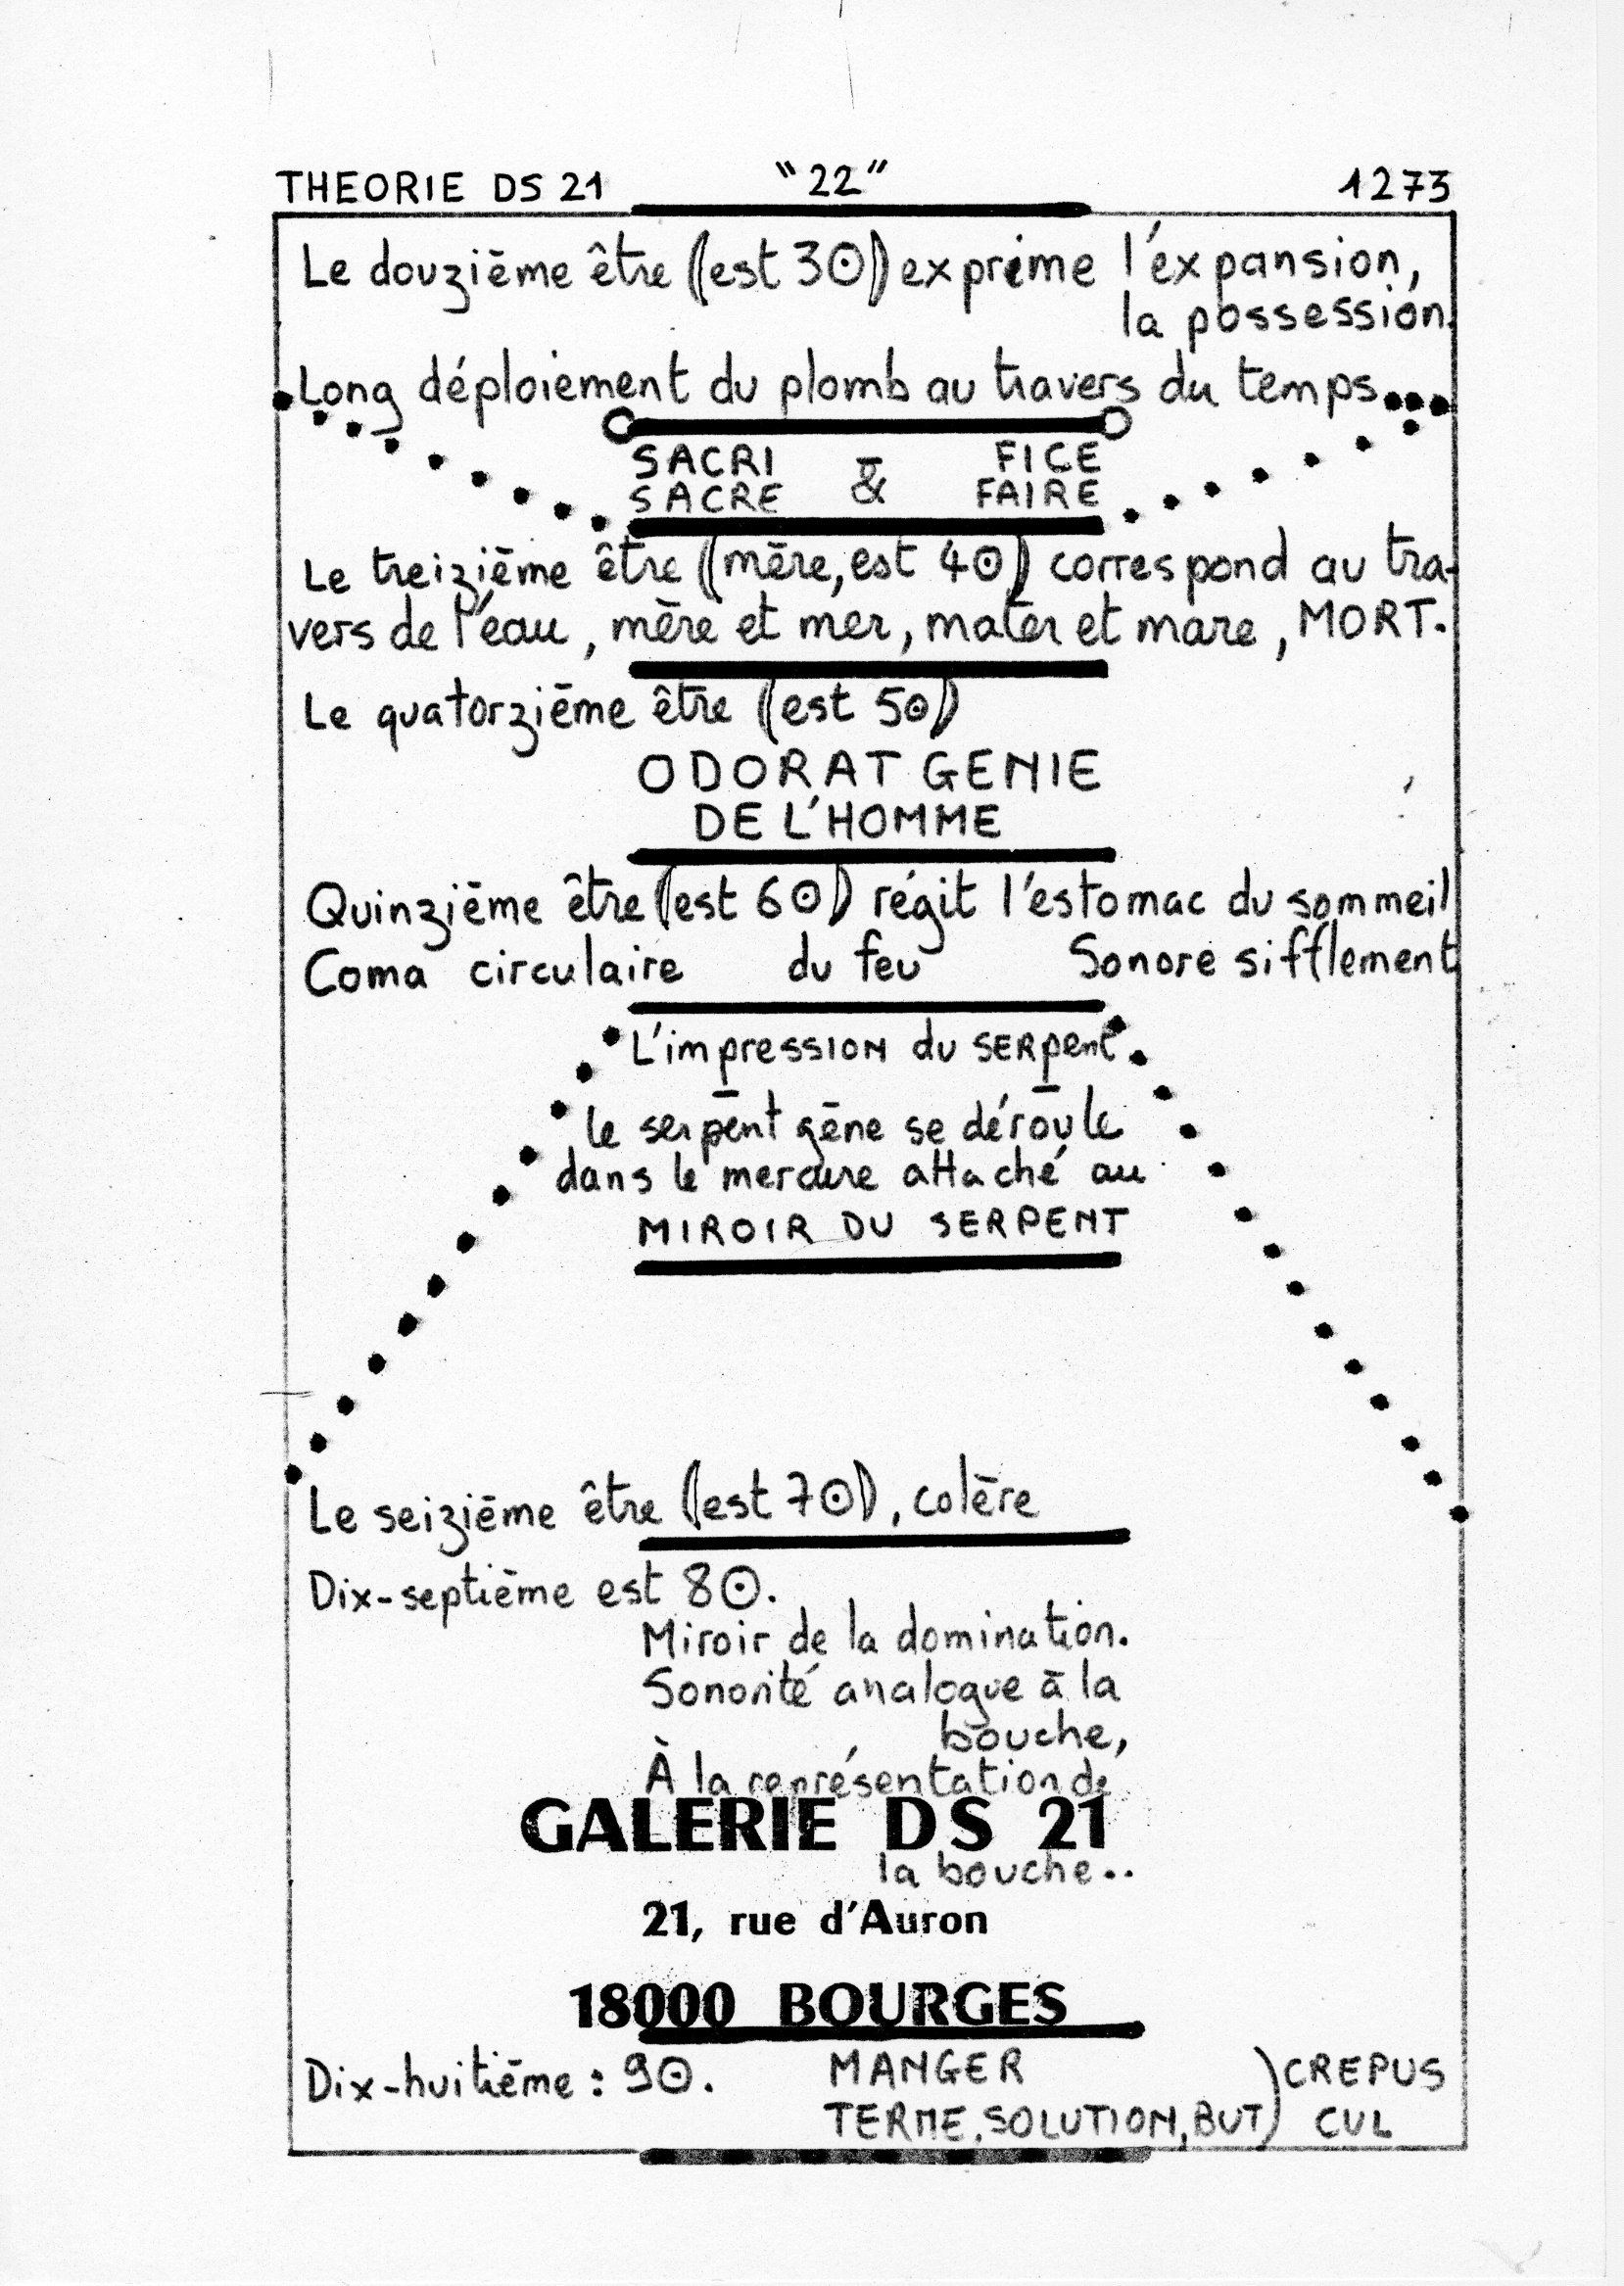 page 1273 Théorie D.S. 21 22